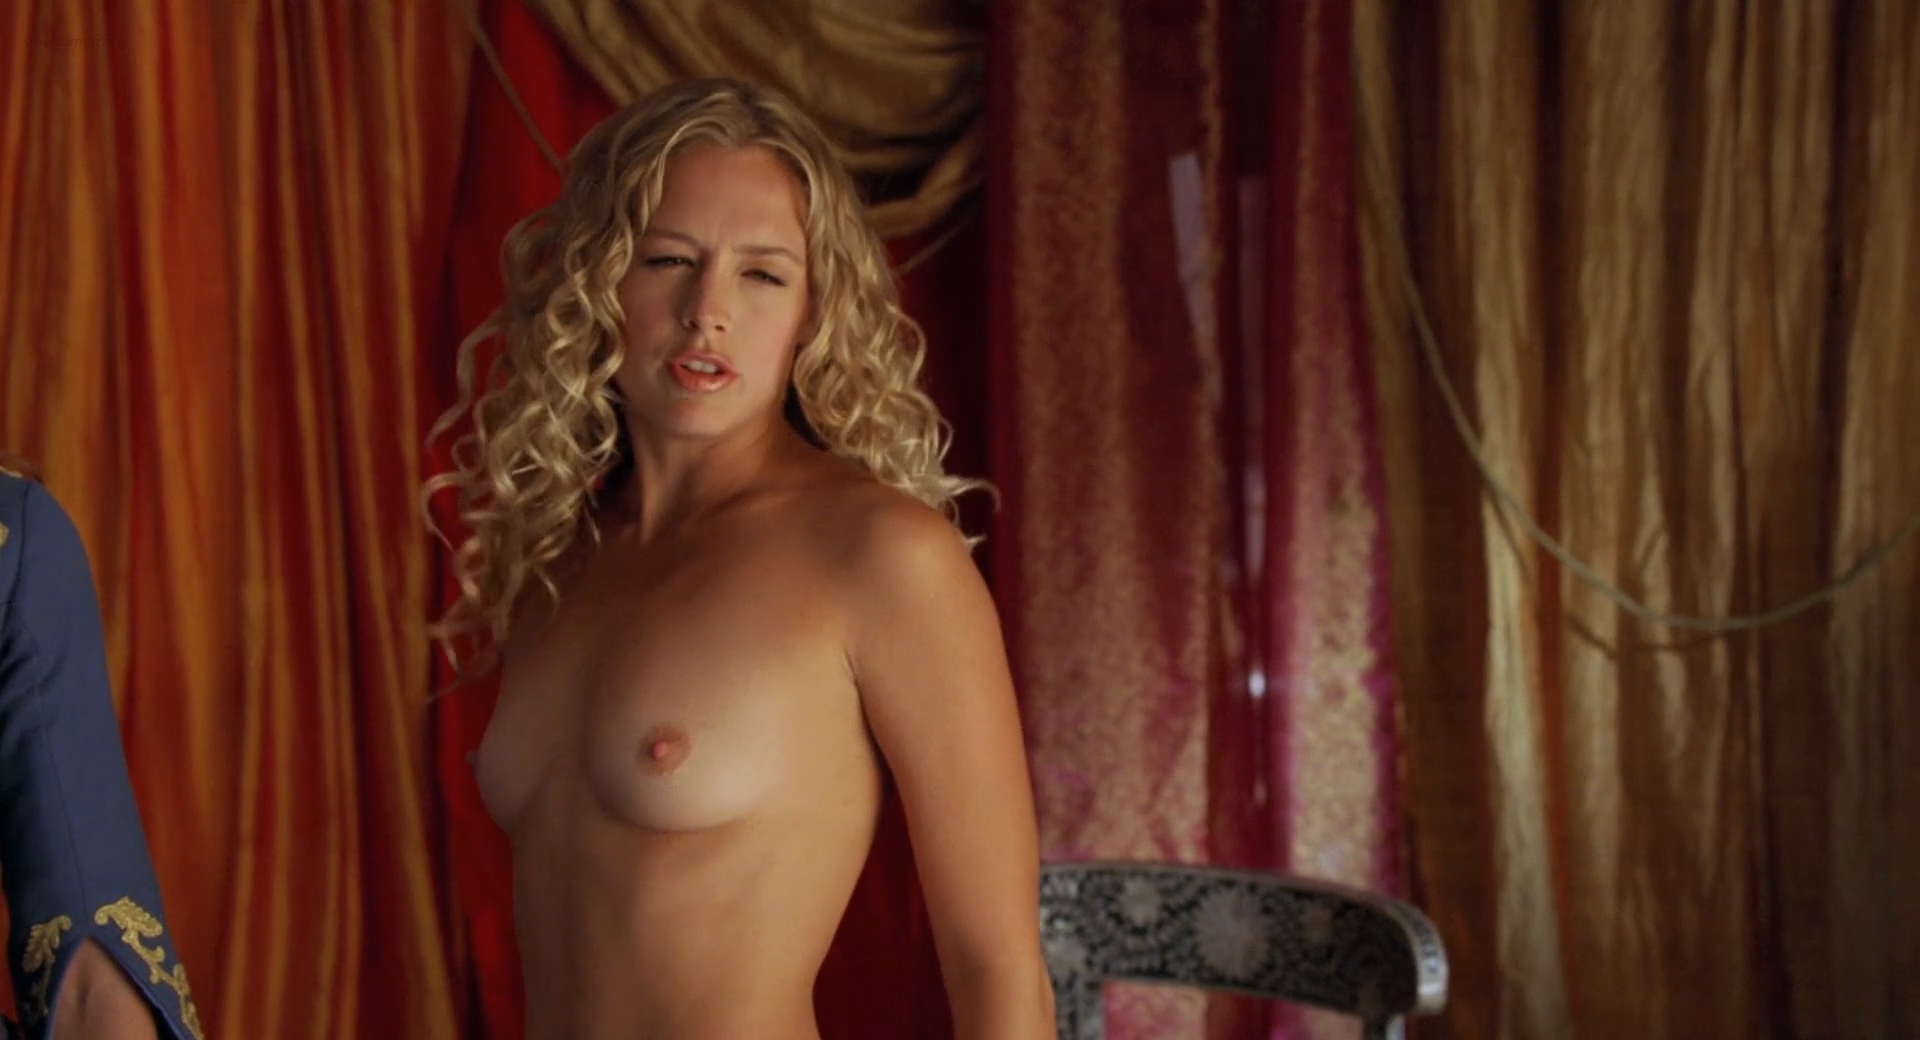 Heather storm naked